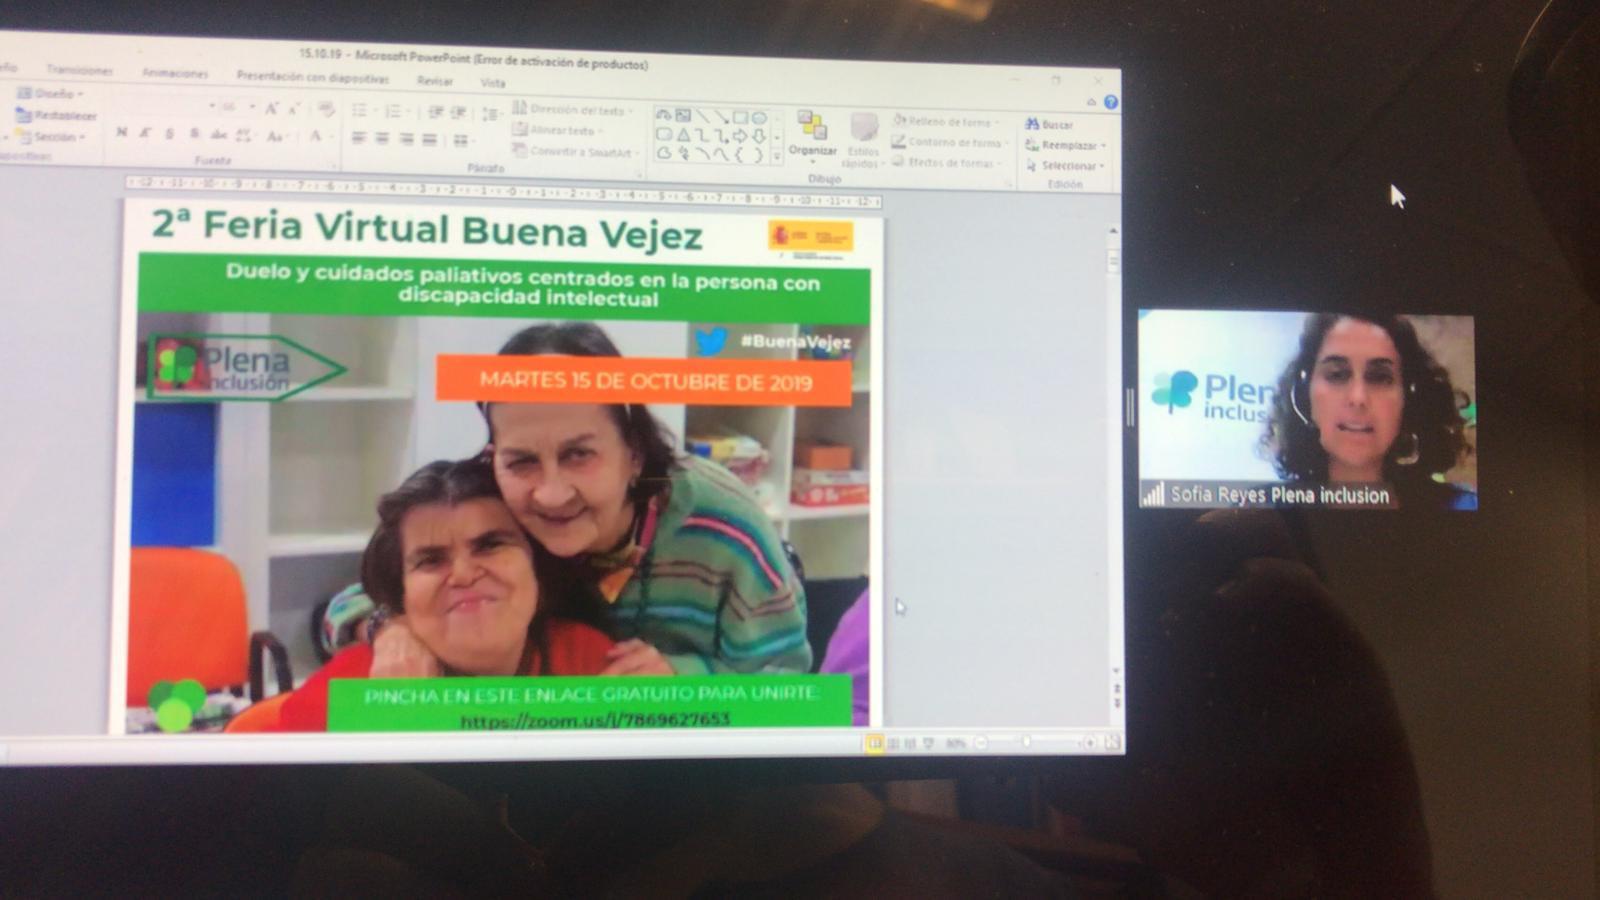 2º Feria Virtual sobre la Buena Vejez